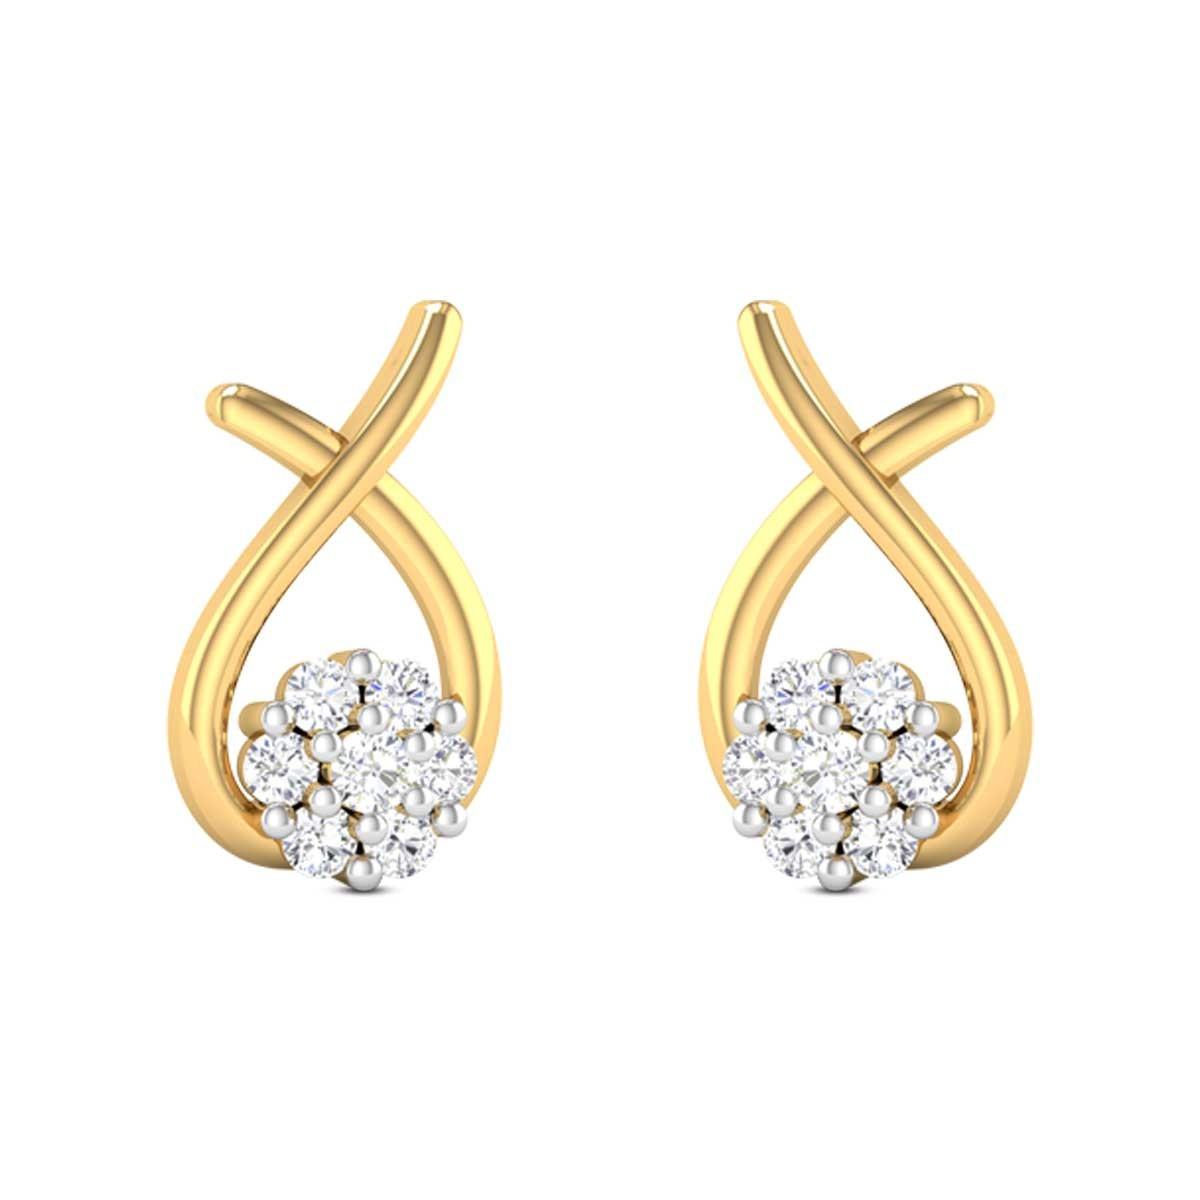 Gigi Diamond Earrings